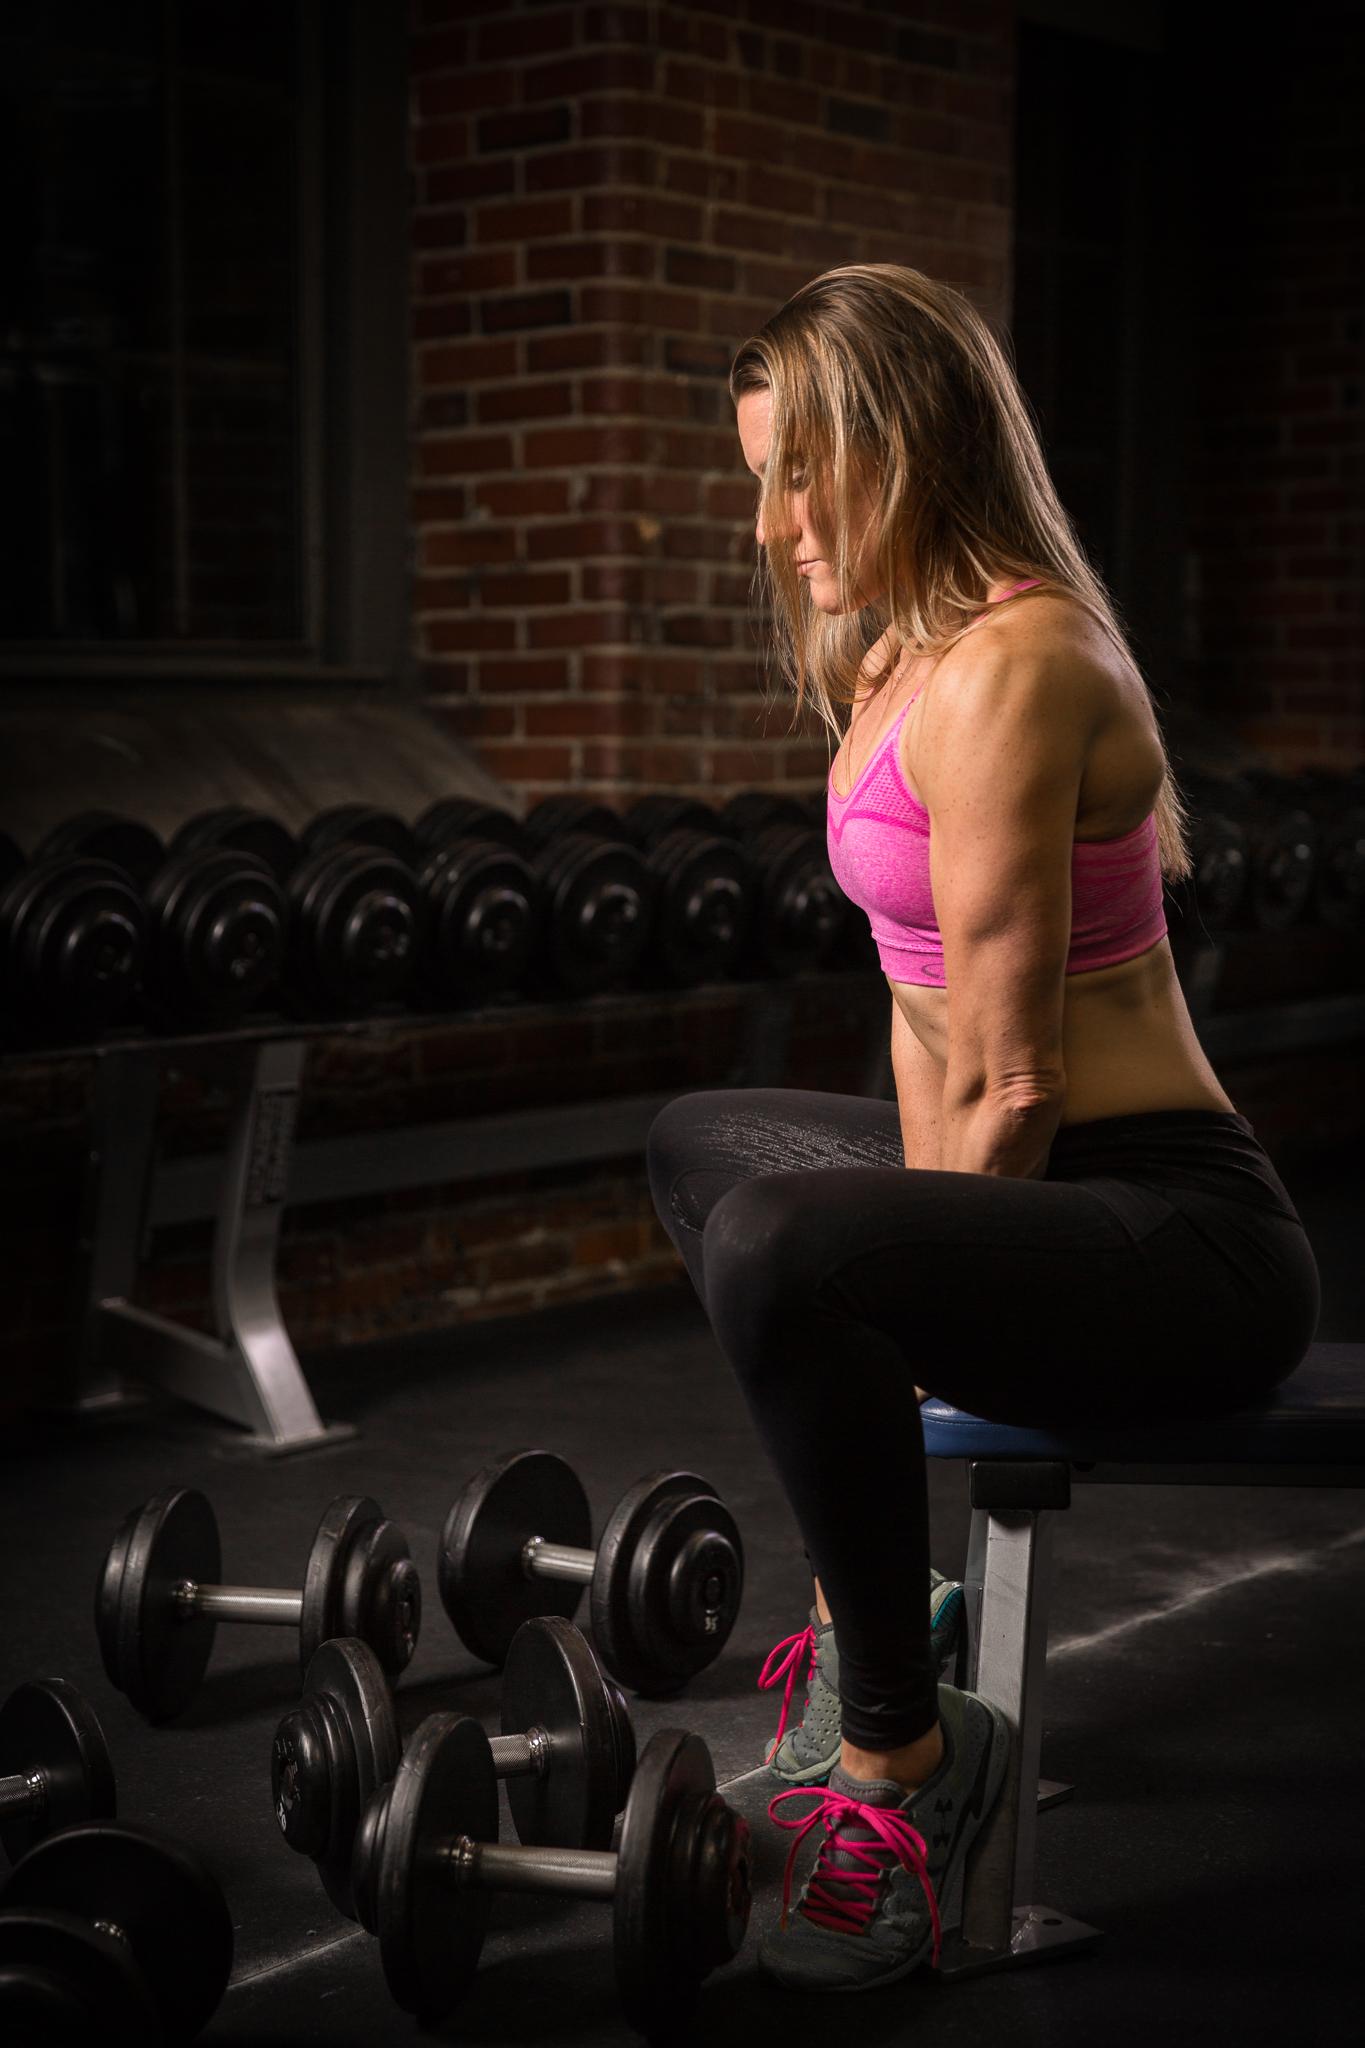 dover-new-hampshire-boston-fitness-photographer-photography-studio-02.jpg